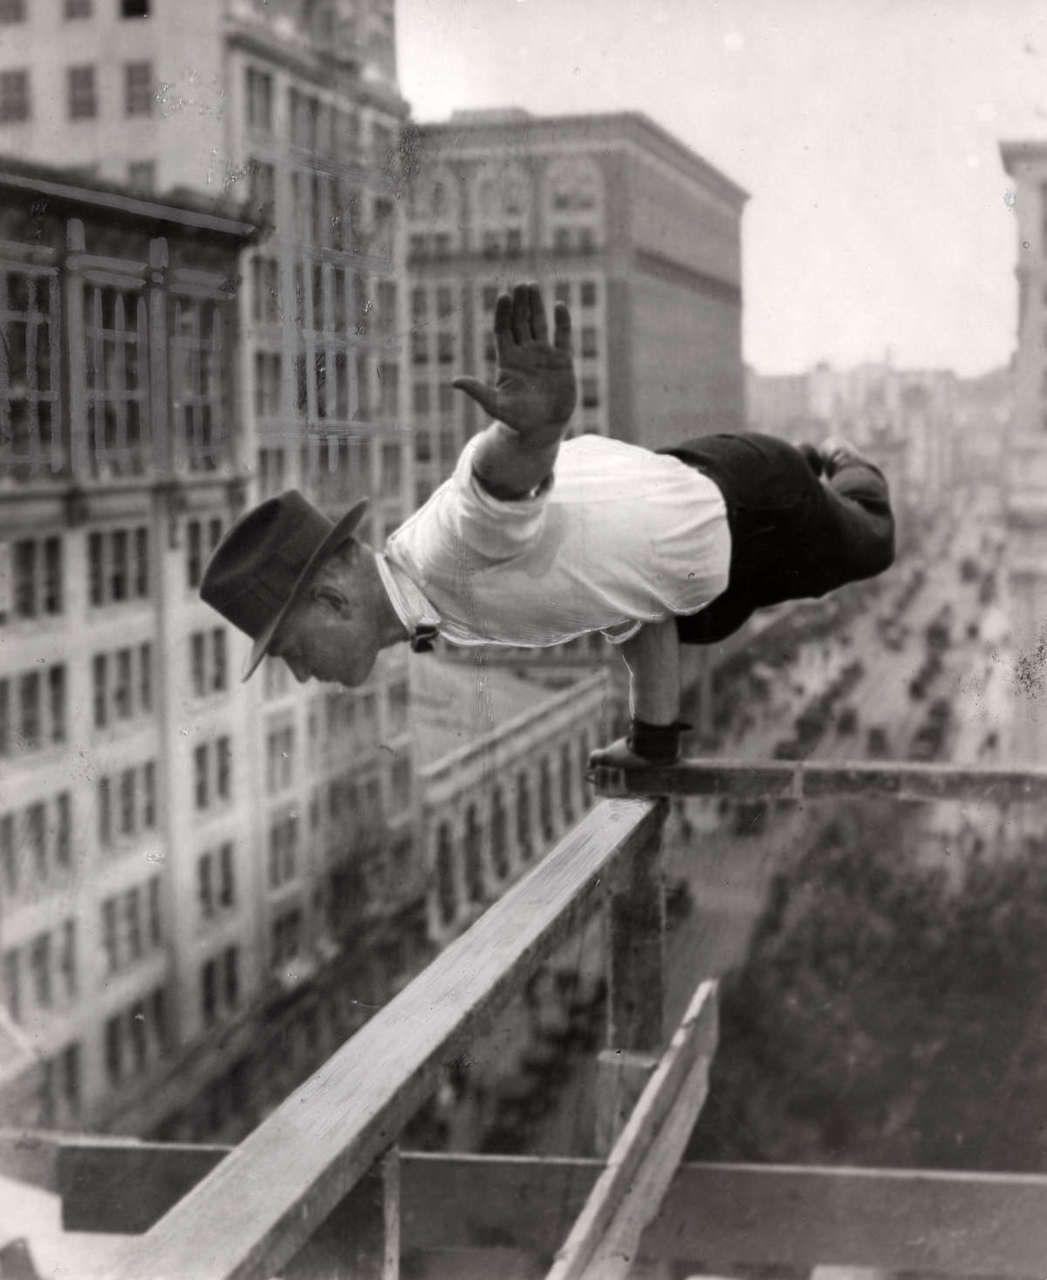 Acrobatics. Large Extent Man Horizontally Arm Scaffolding. York